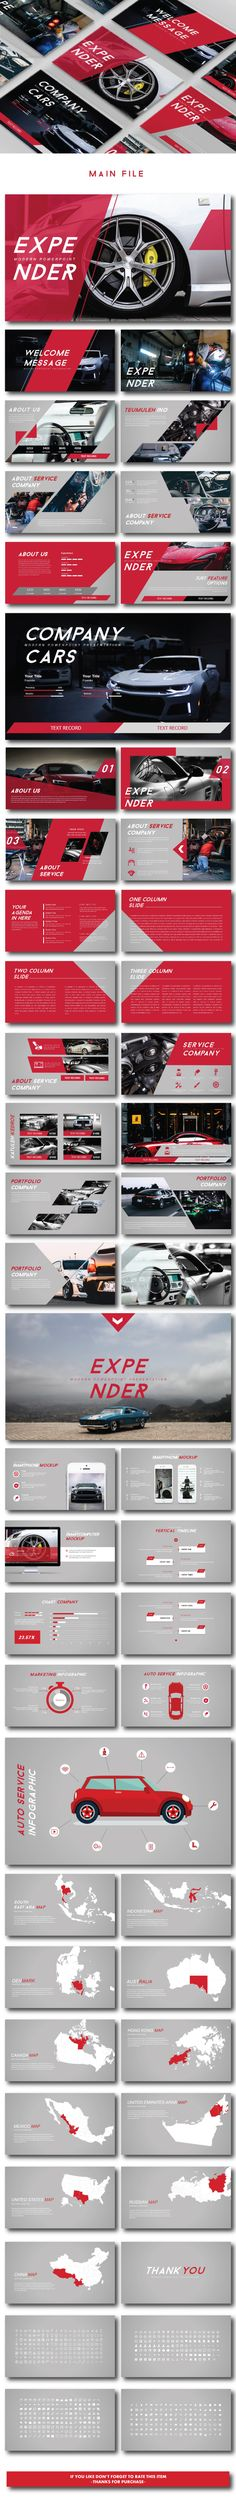 #Expender Modern PPTX - Creative #PowerPoint Templates